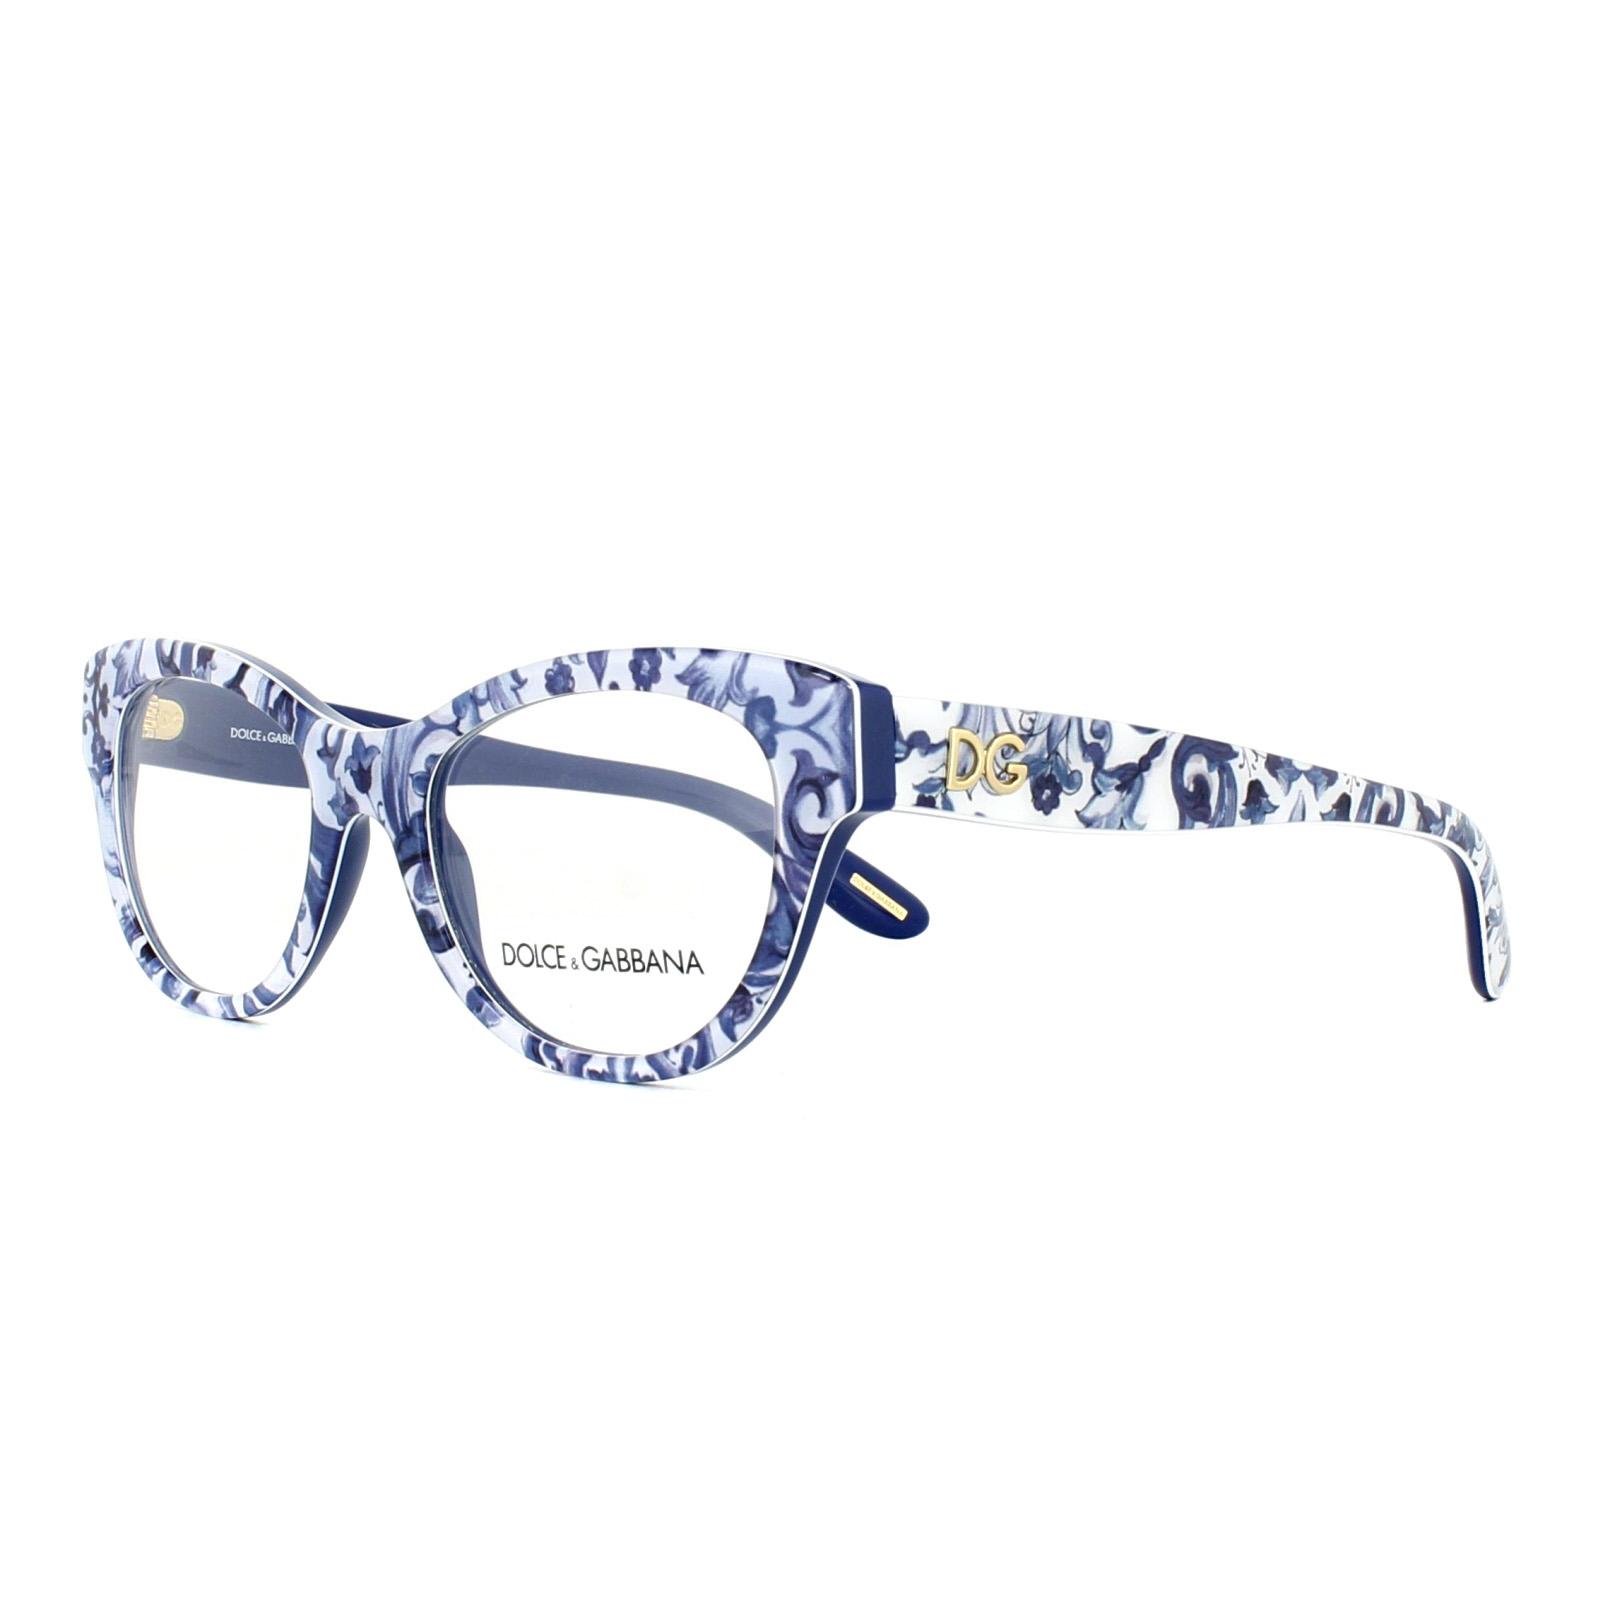 280bb6287b Sentinel Dolce   Gabbana Glasses Frames DG 3203 2993 Maioliche Partenopee  Blue Flowers 51